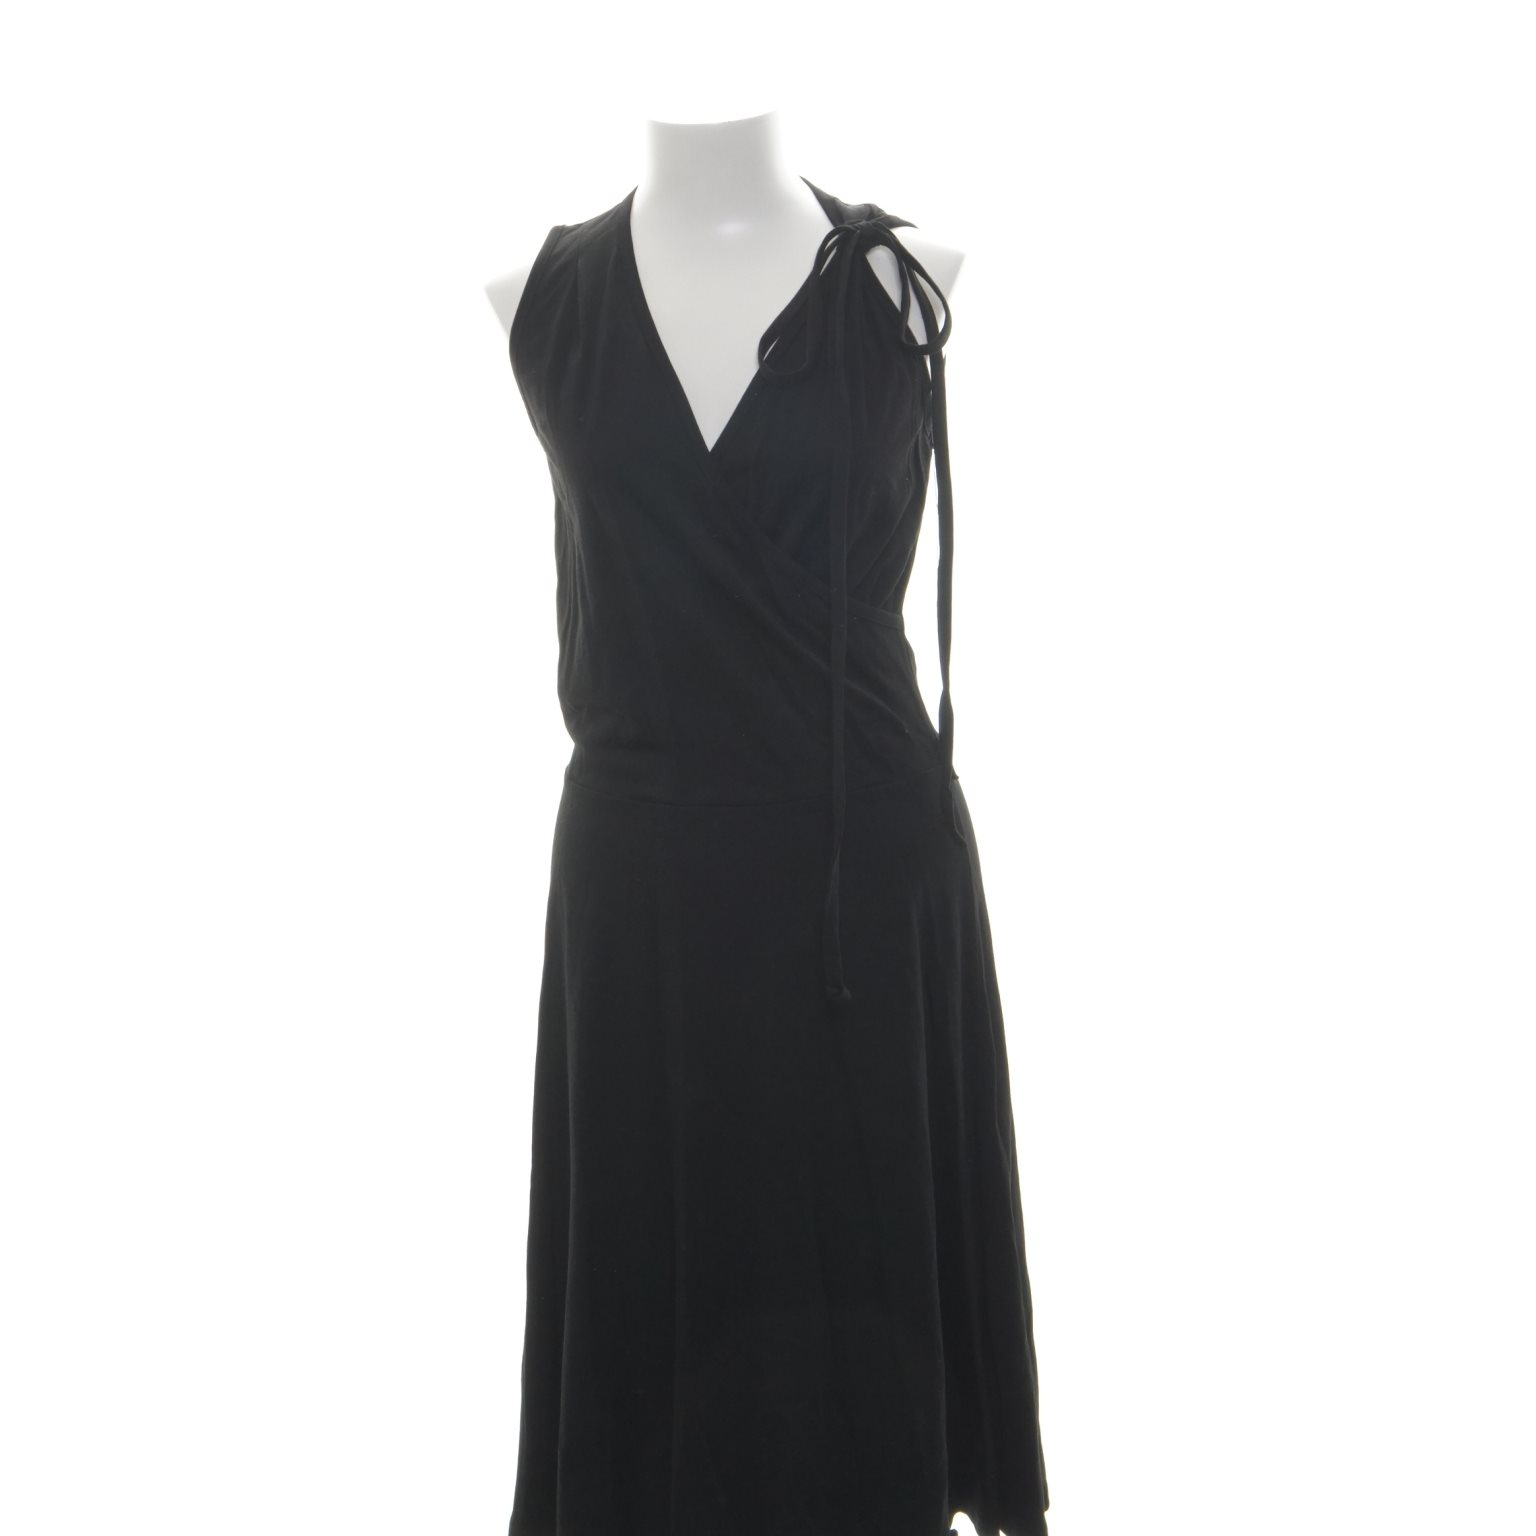 883532764536 Bric A Brac, Klänning, Strl: S, I.dress F.. (333515046) ᐈ Sellpy på ...